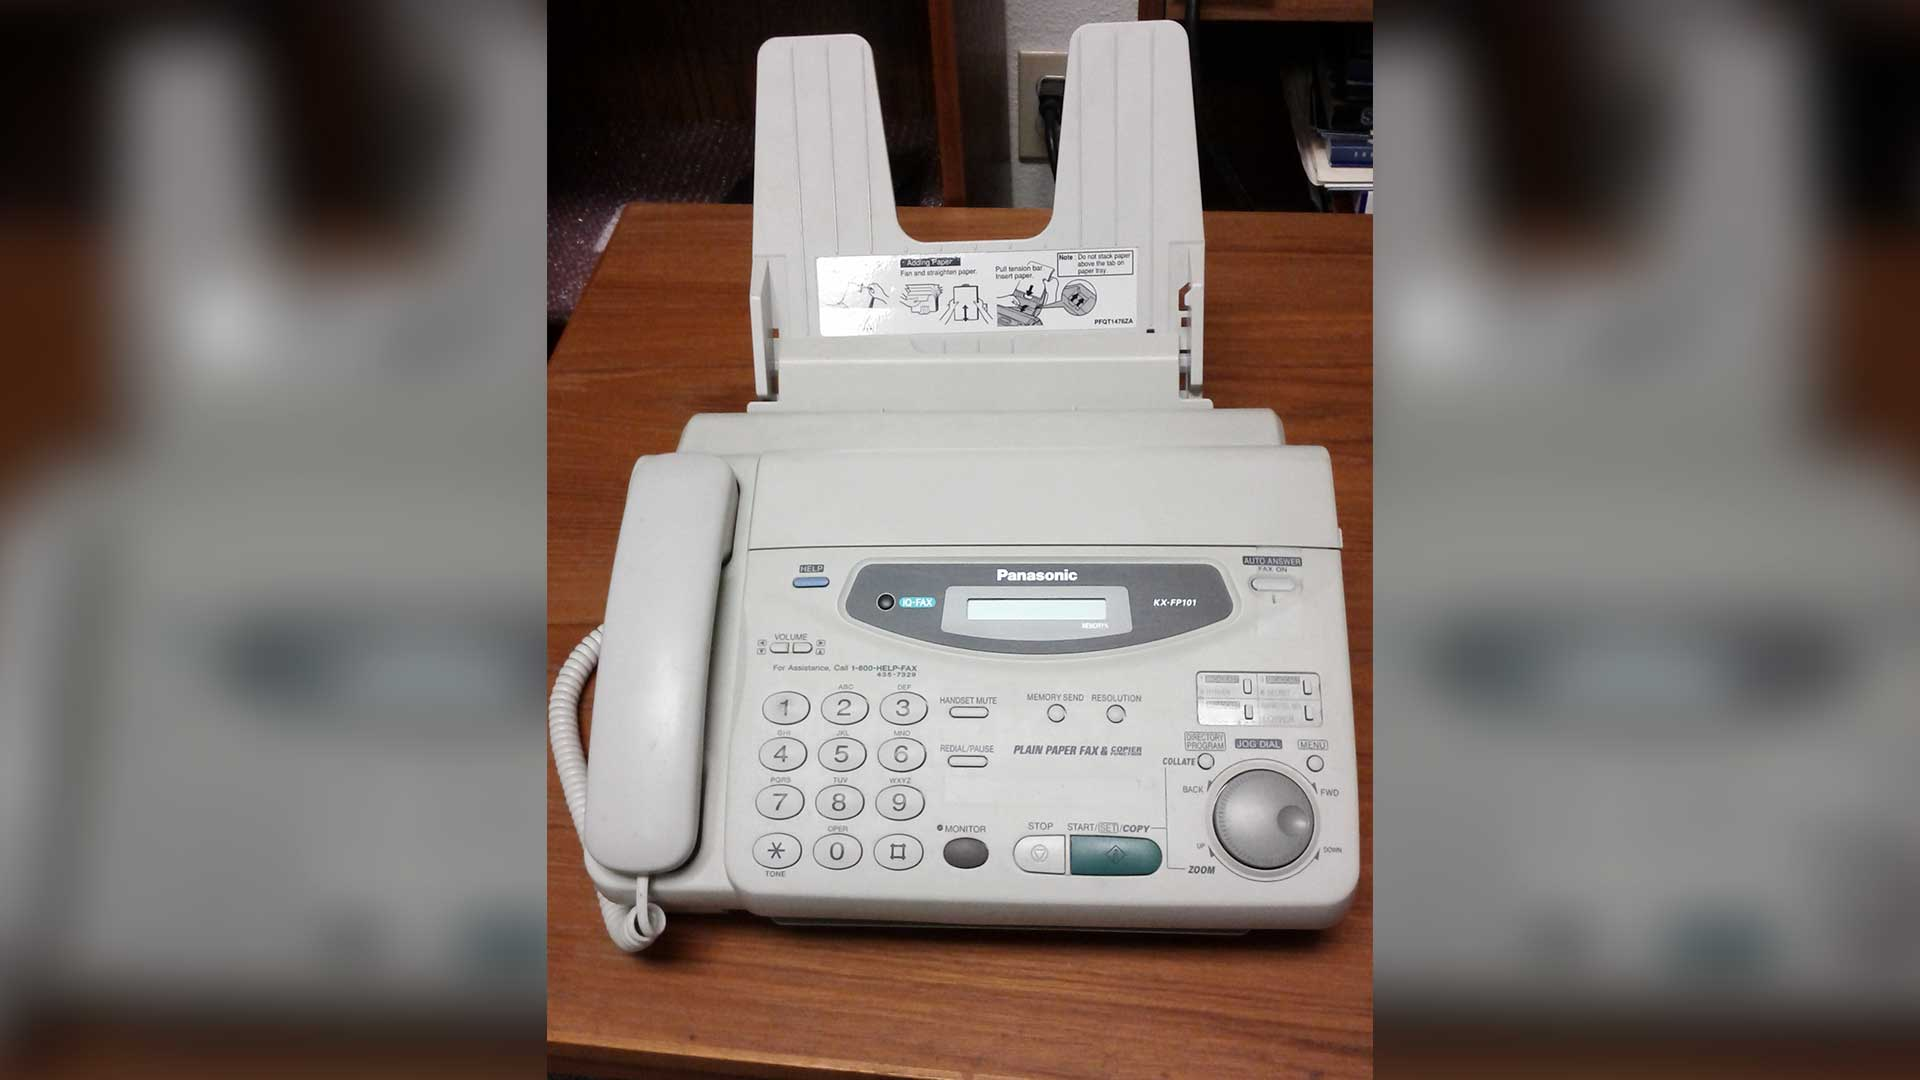 Fax-Machine-Afraid-No-Living-Friends-Will-Attend-Retirement-Party.jpg